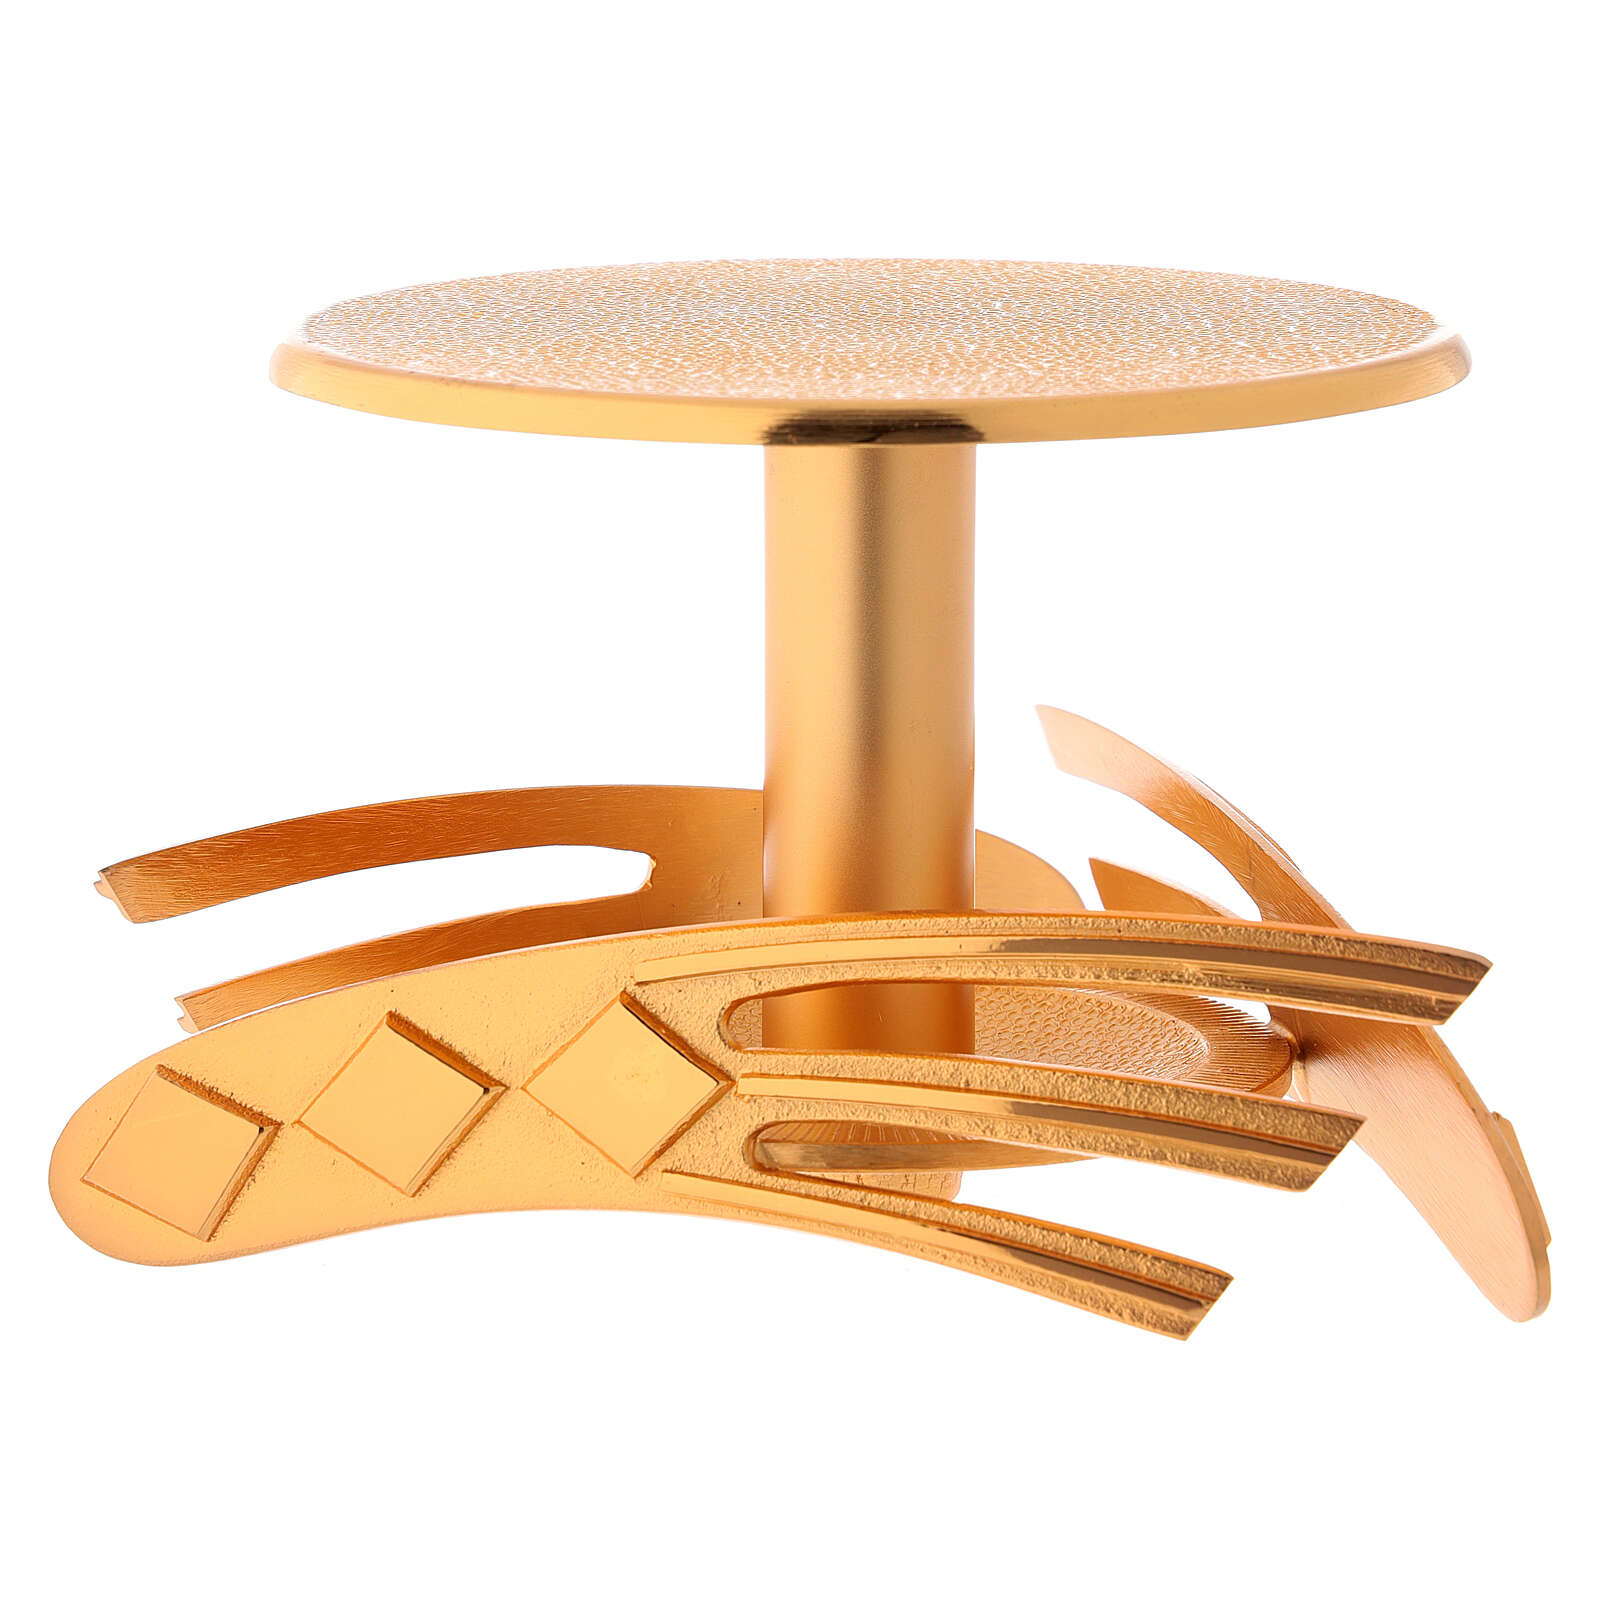 Ostensory base in golden cast brass, 12 cm high 4